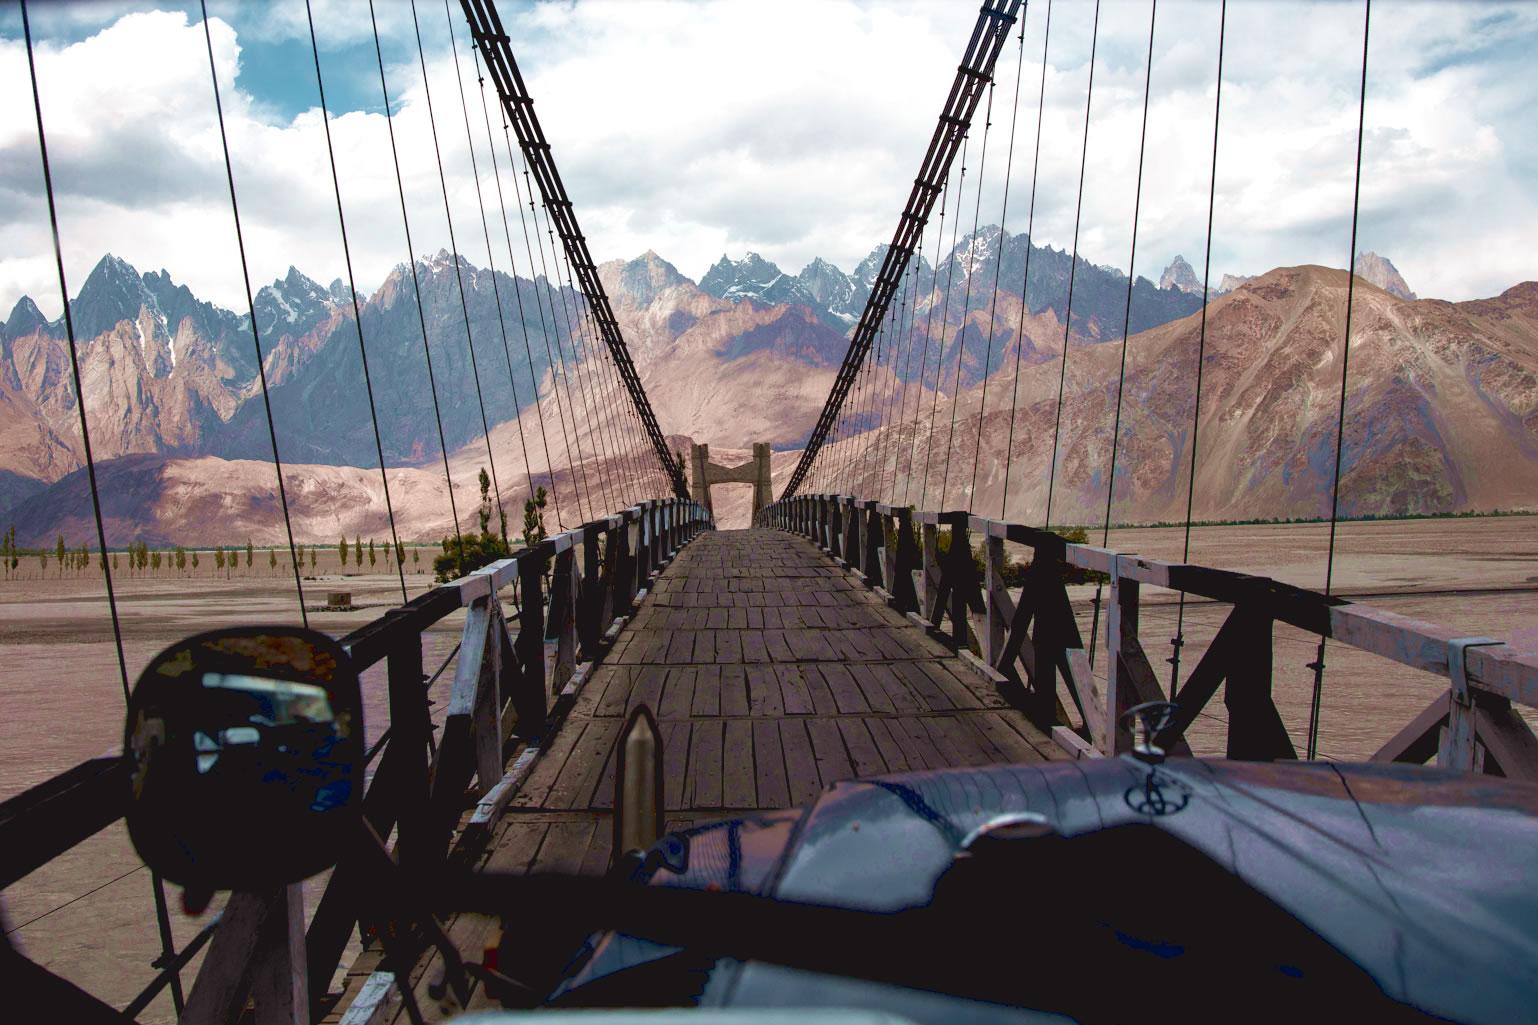 #alpinistcommunityproject Krystle Wright